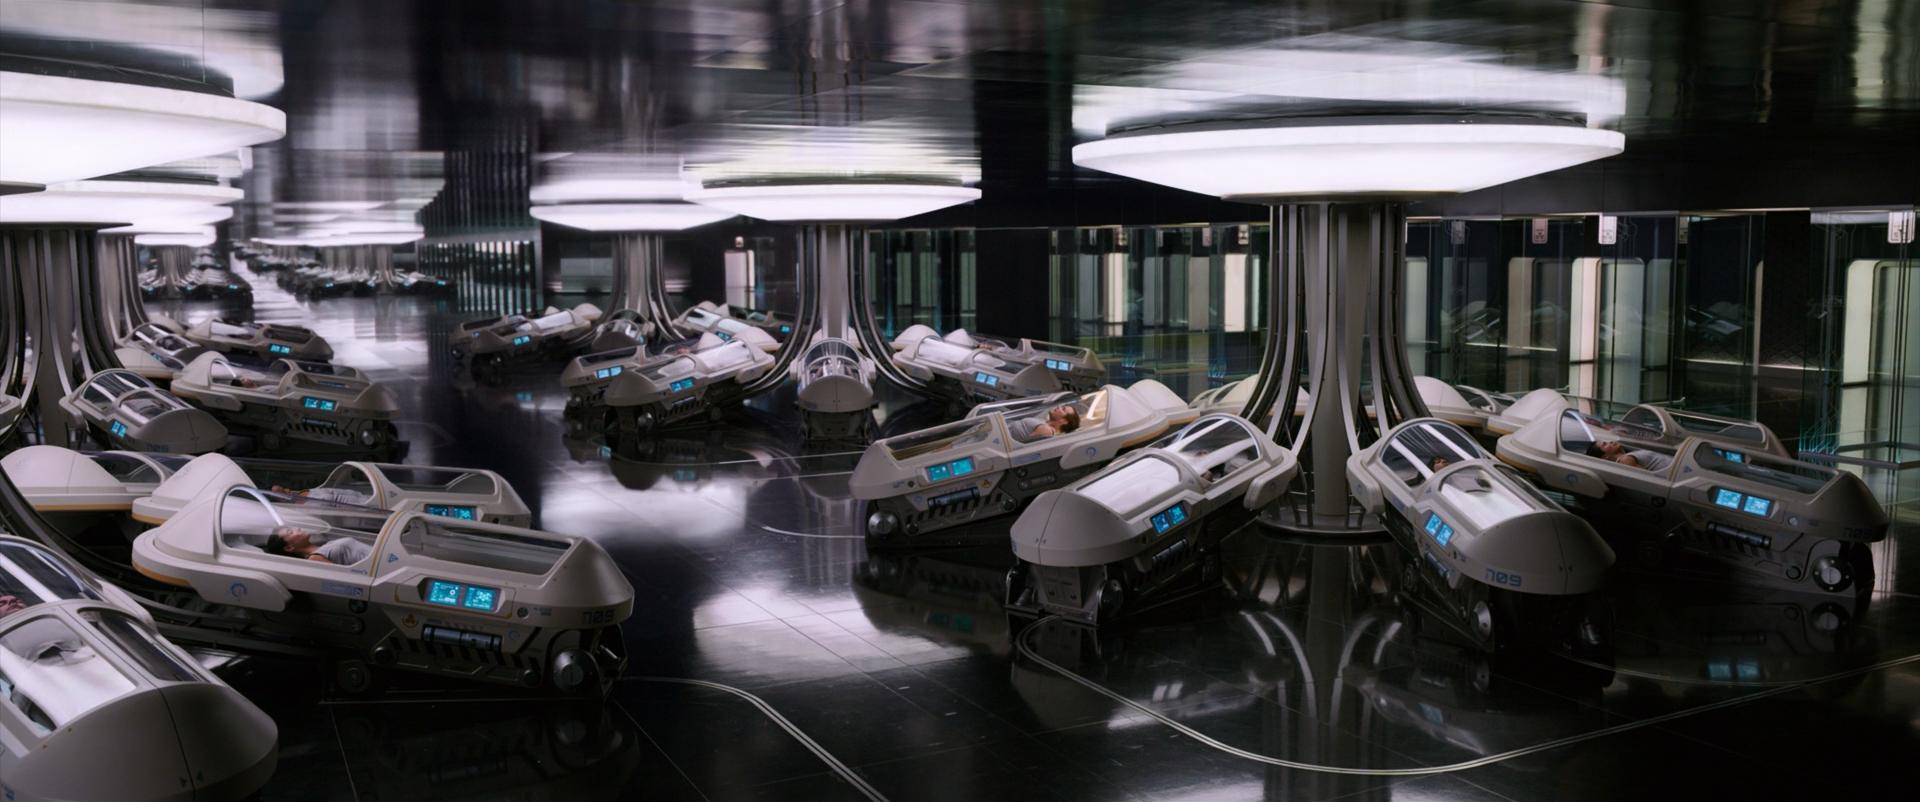 Пассажиры / Passengers (2016) BDRip 1080p | Лицензия